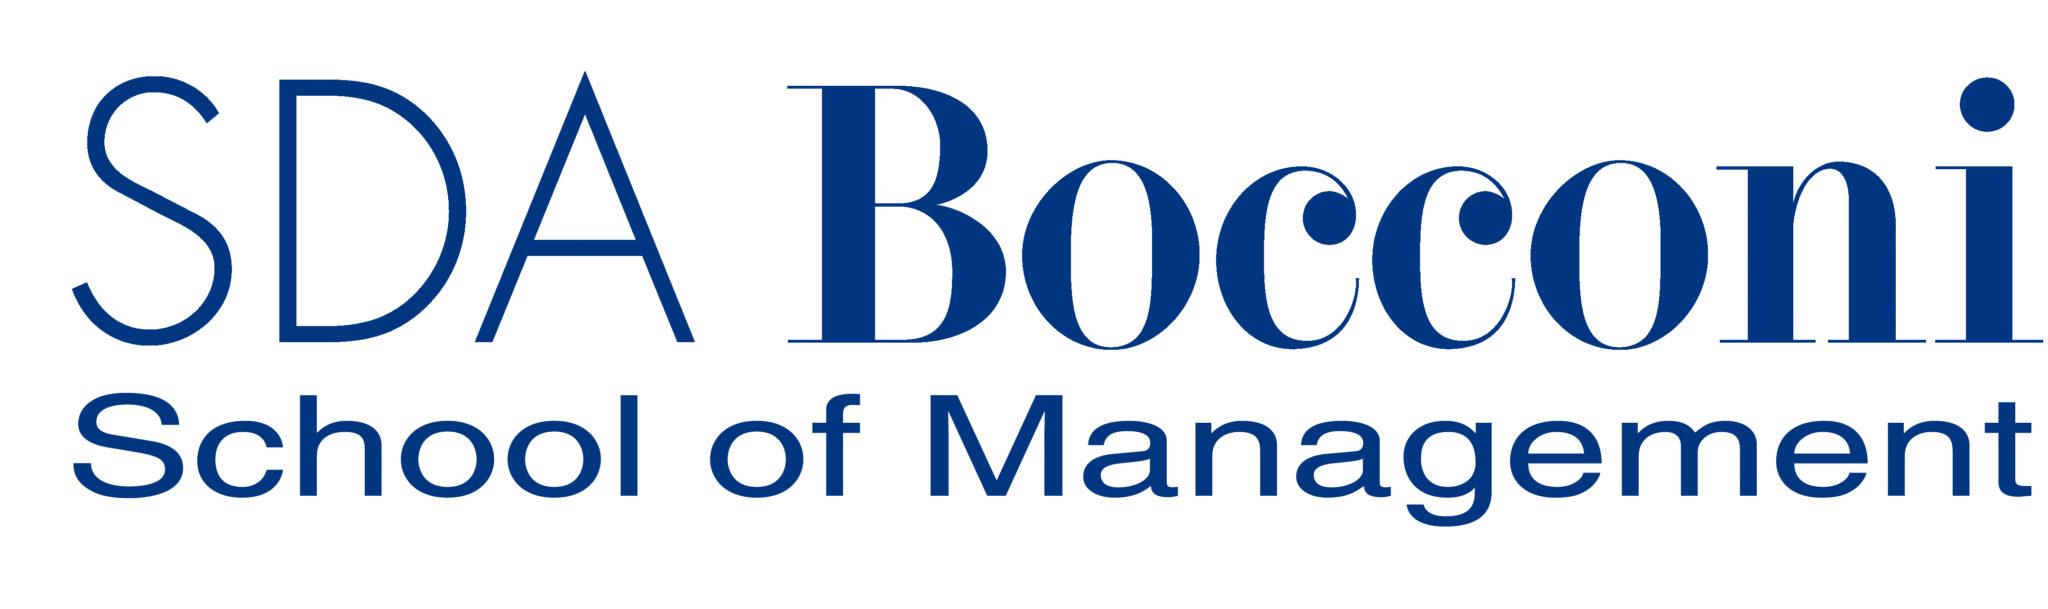 4 datos que no sabías sobre SDA Bocconi School of management